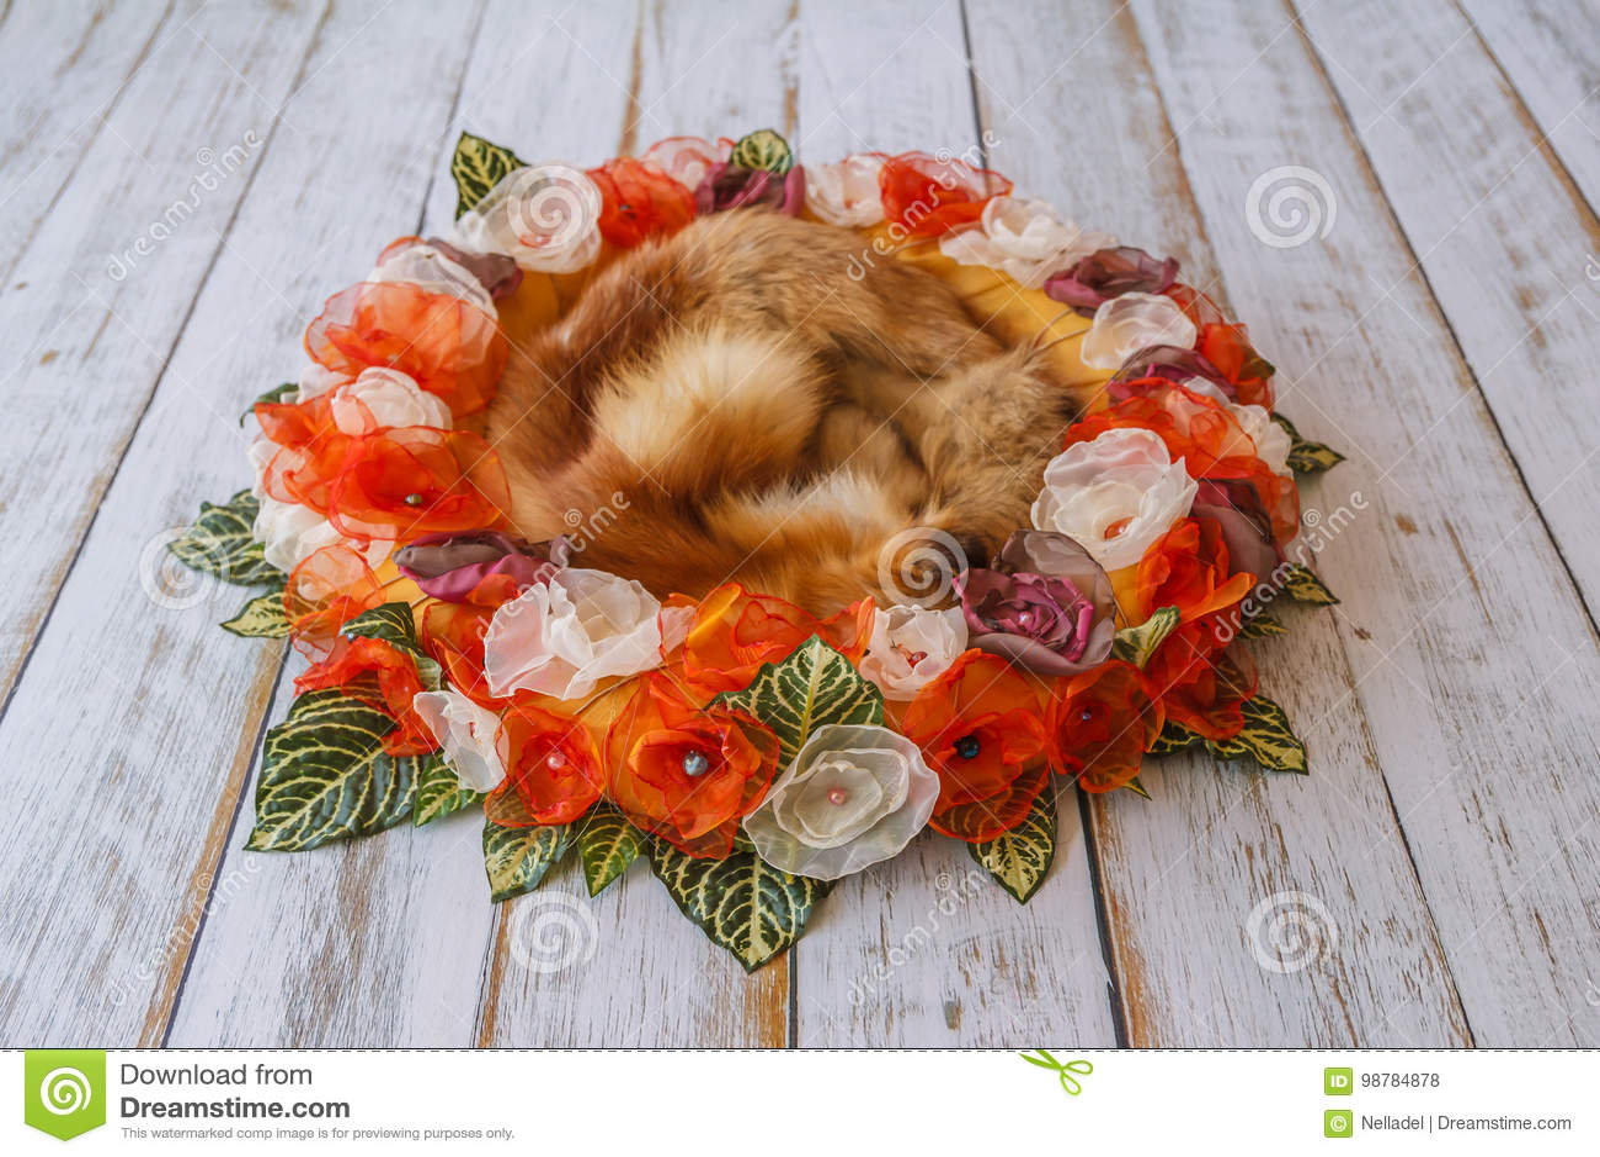 Orange Handmade Flower Circle For Newborn Babies With Fox Fur In ...